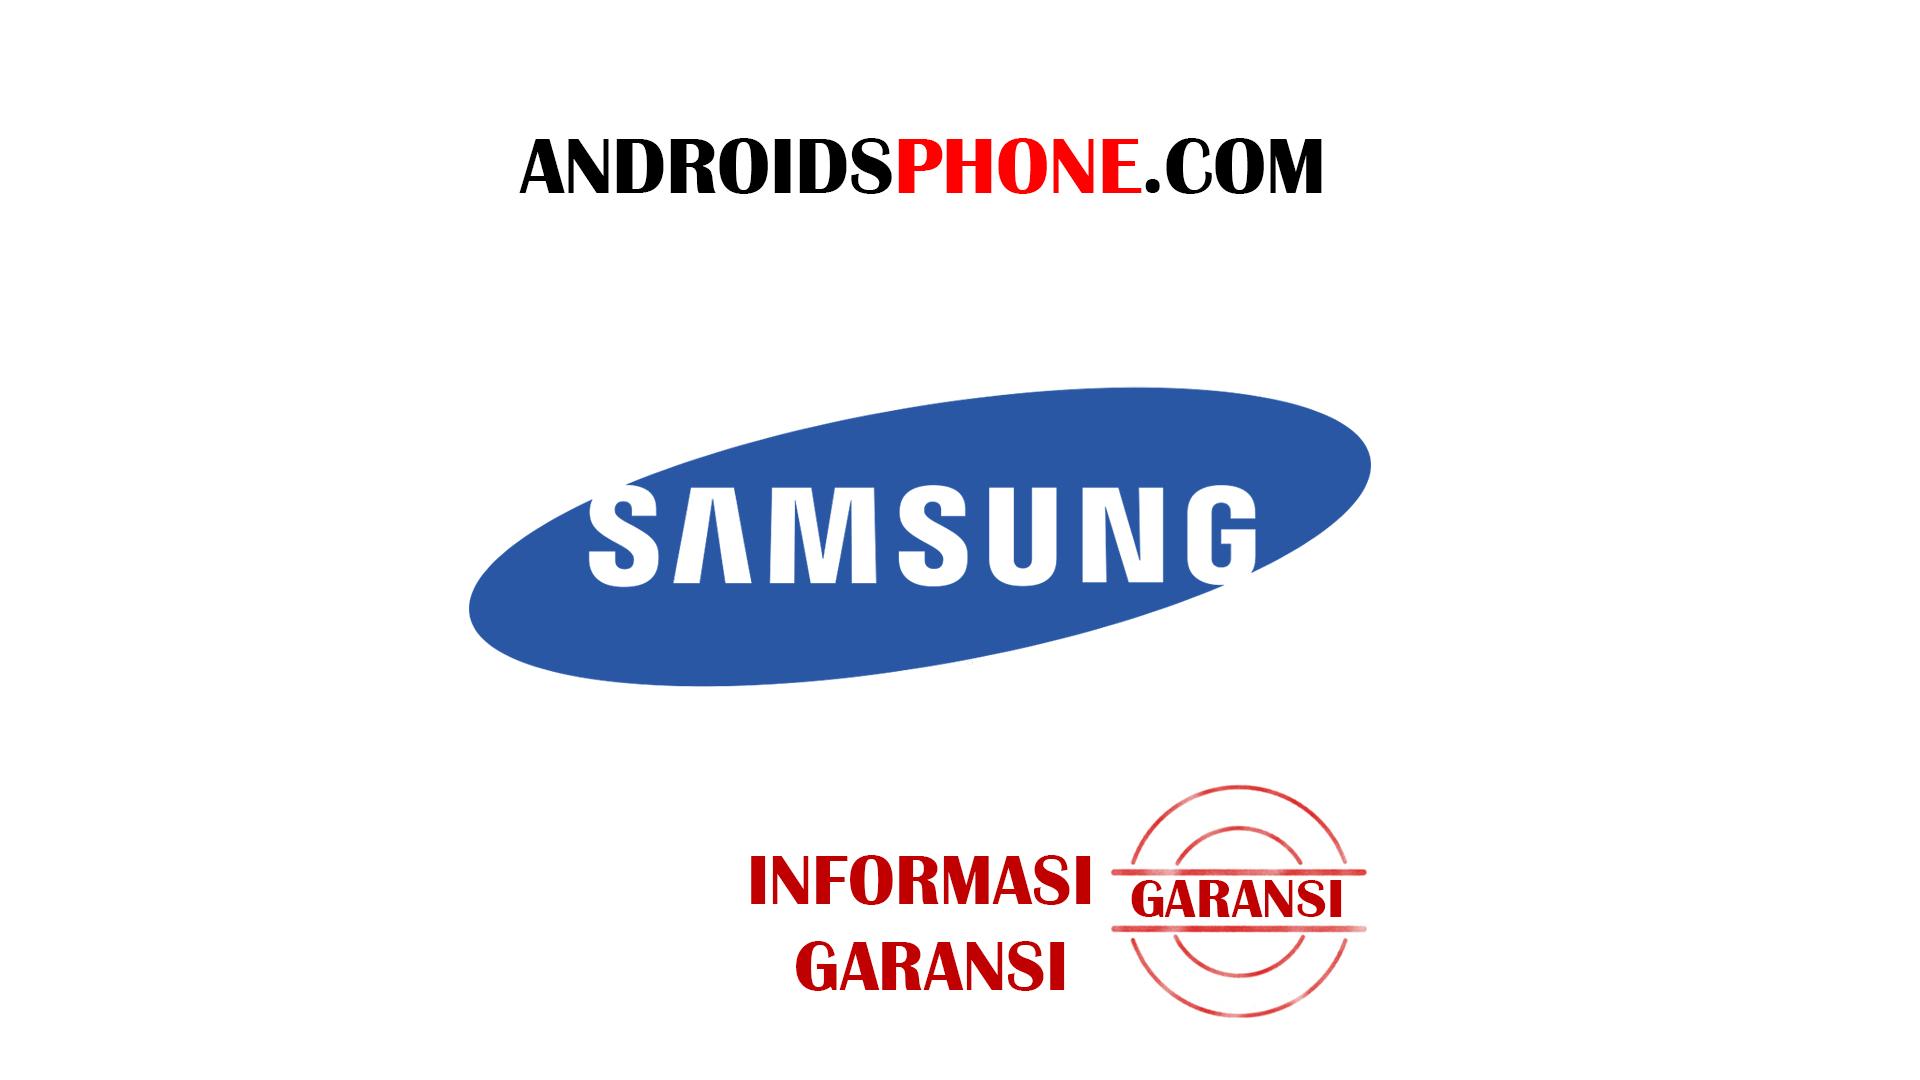 Cara Klaim Garansi Handphone Samsung Beserta Syaratnya Terbaru